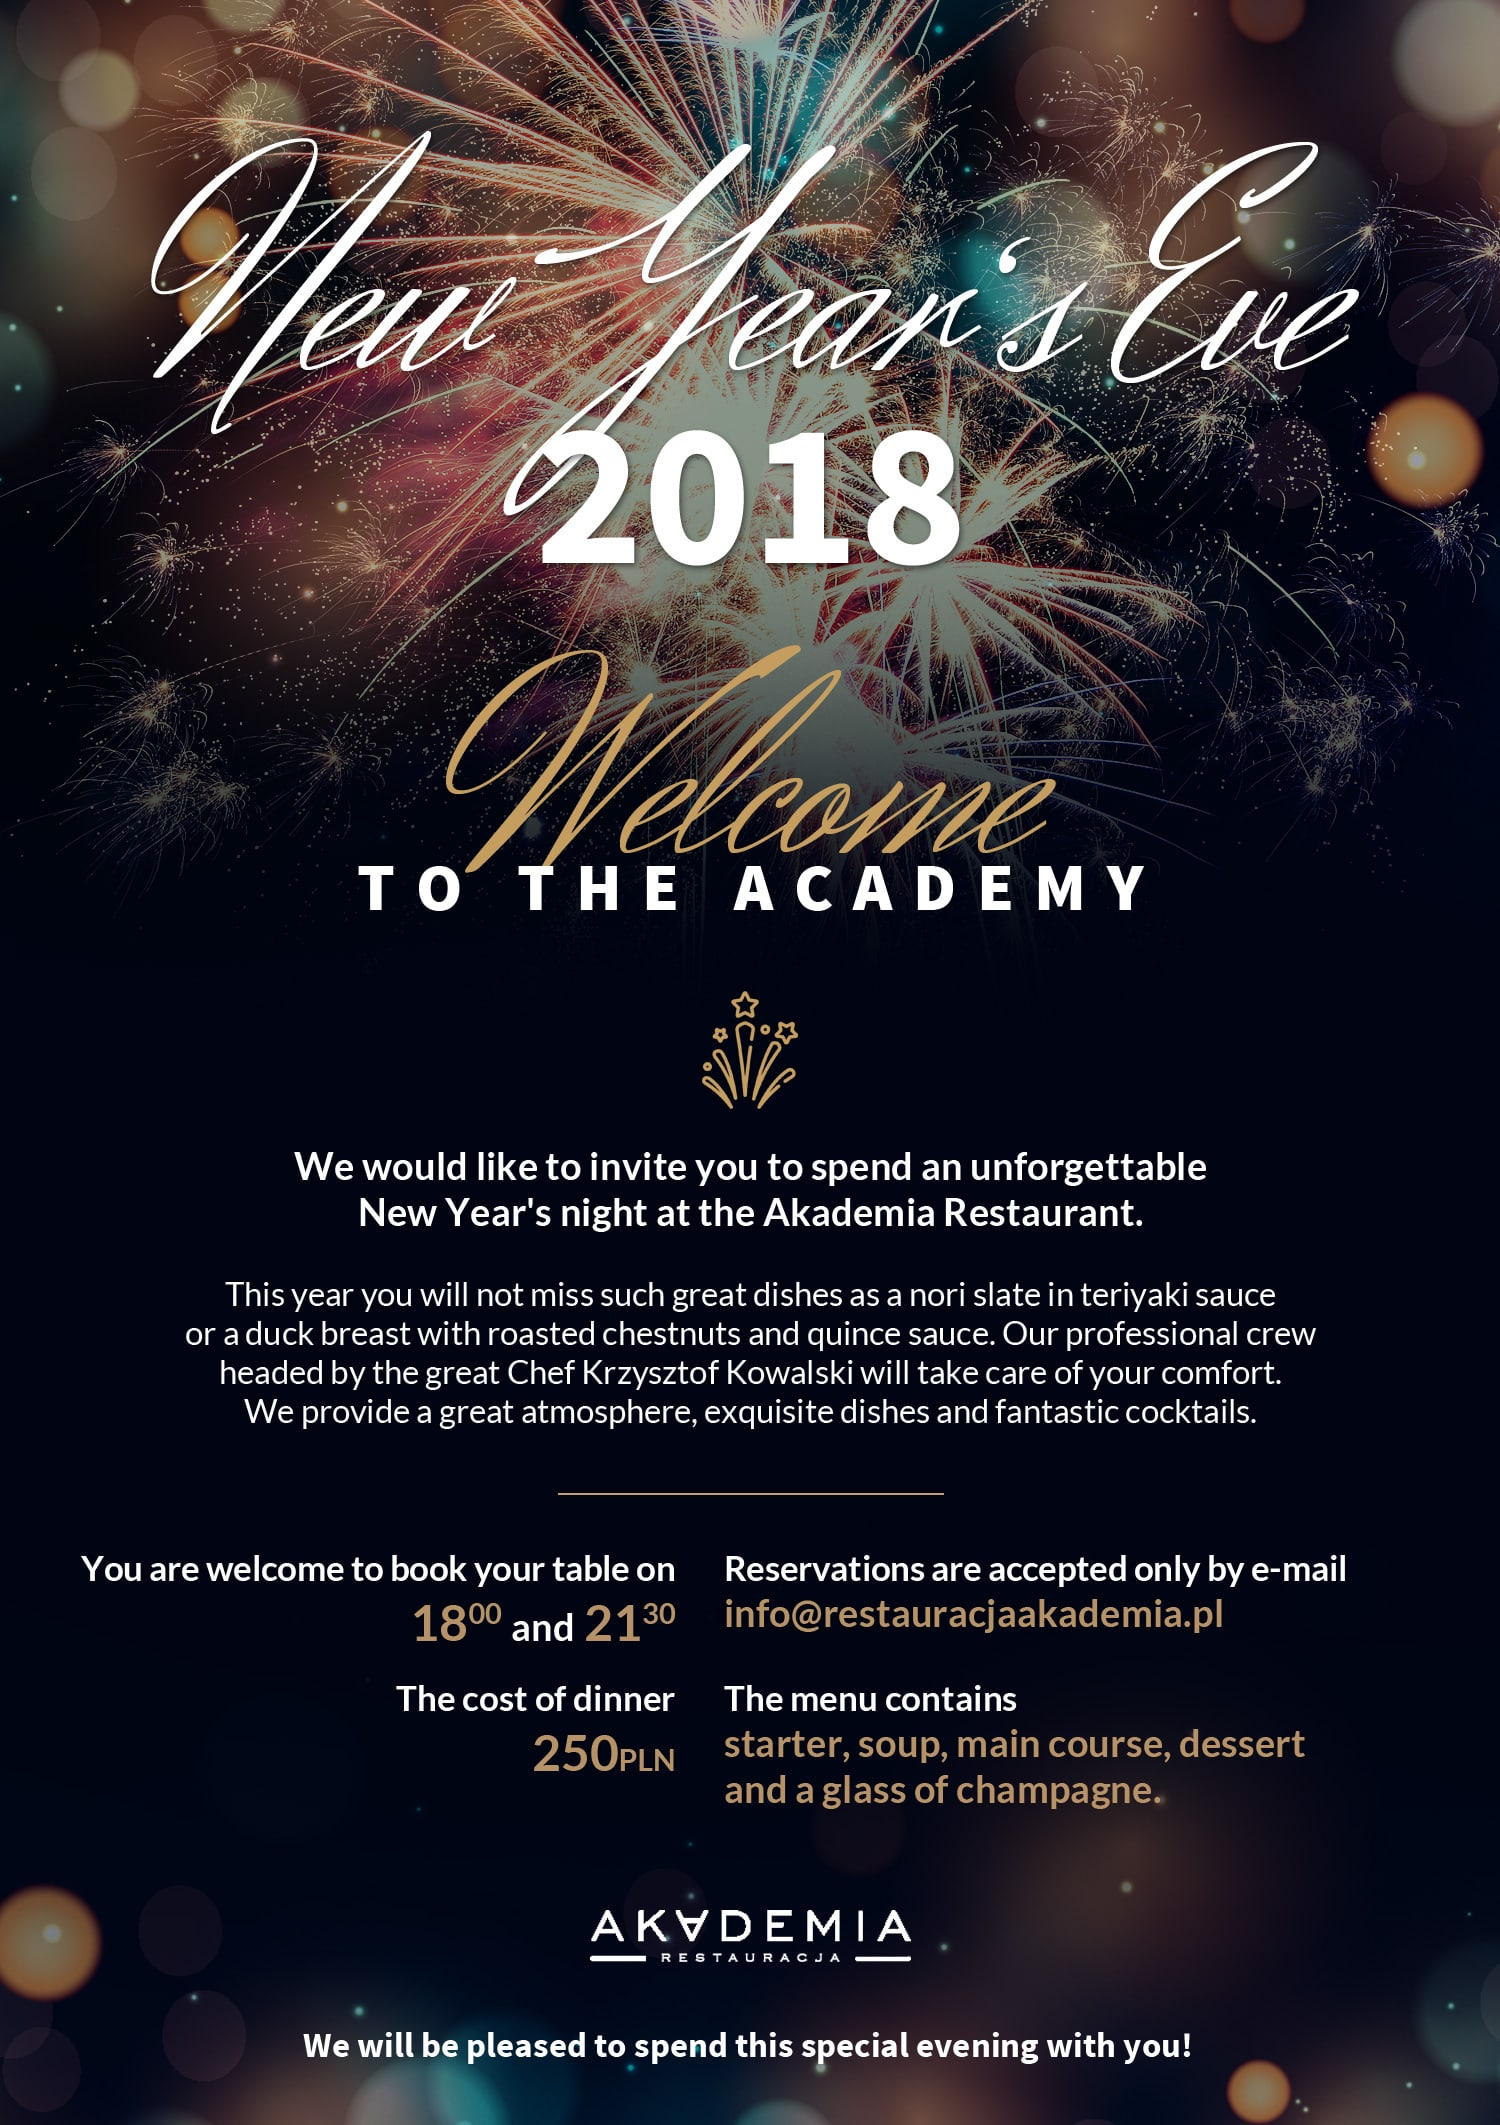 New Year's Eve 2018 in Akademia Restaurant